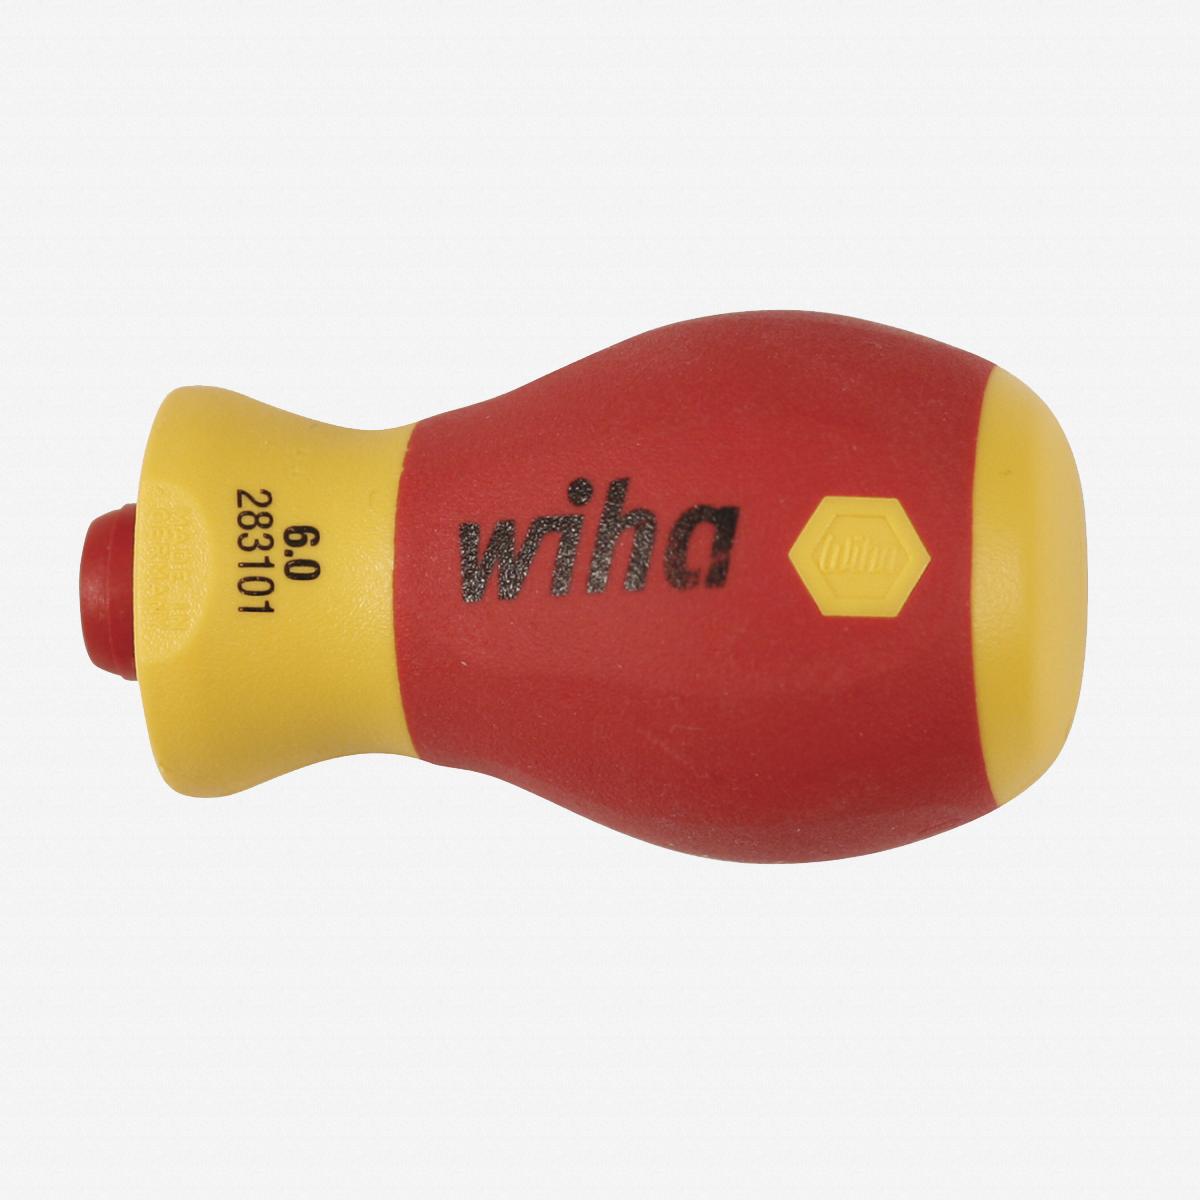 Wiha 28302 Insulated Stubby SlimLine Handle - KC Tool